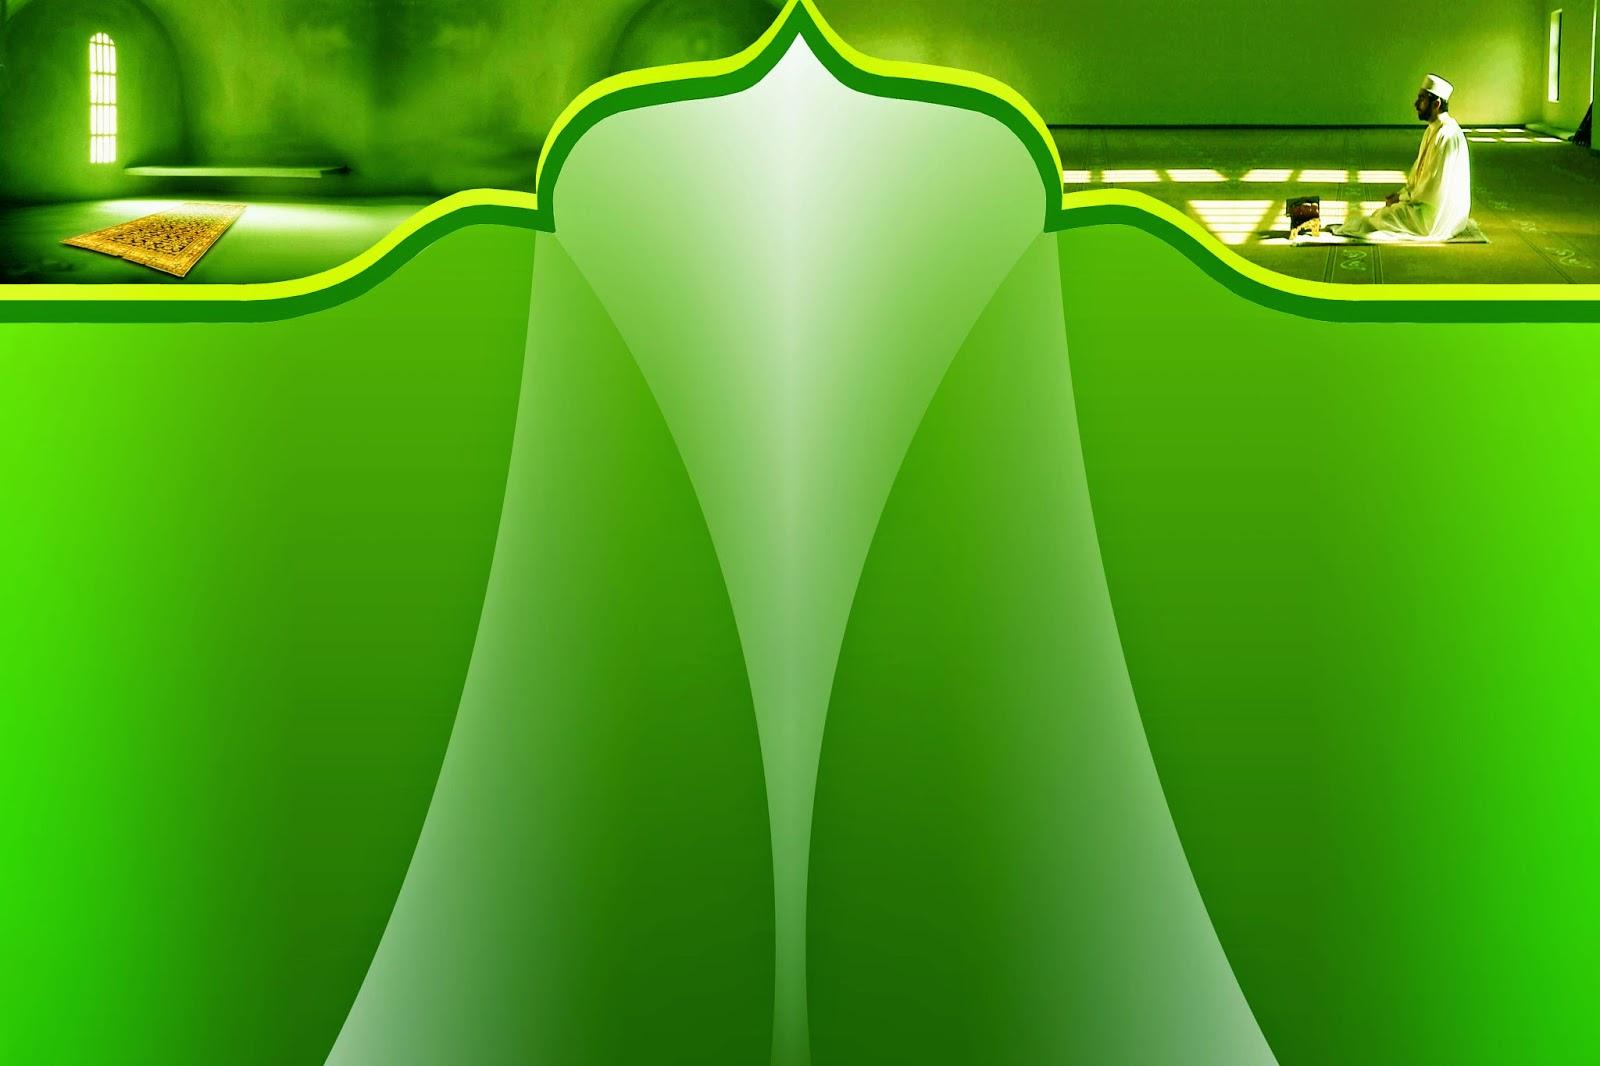 Backdrop Islami | Joy Studio Design Gallery - Best Design